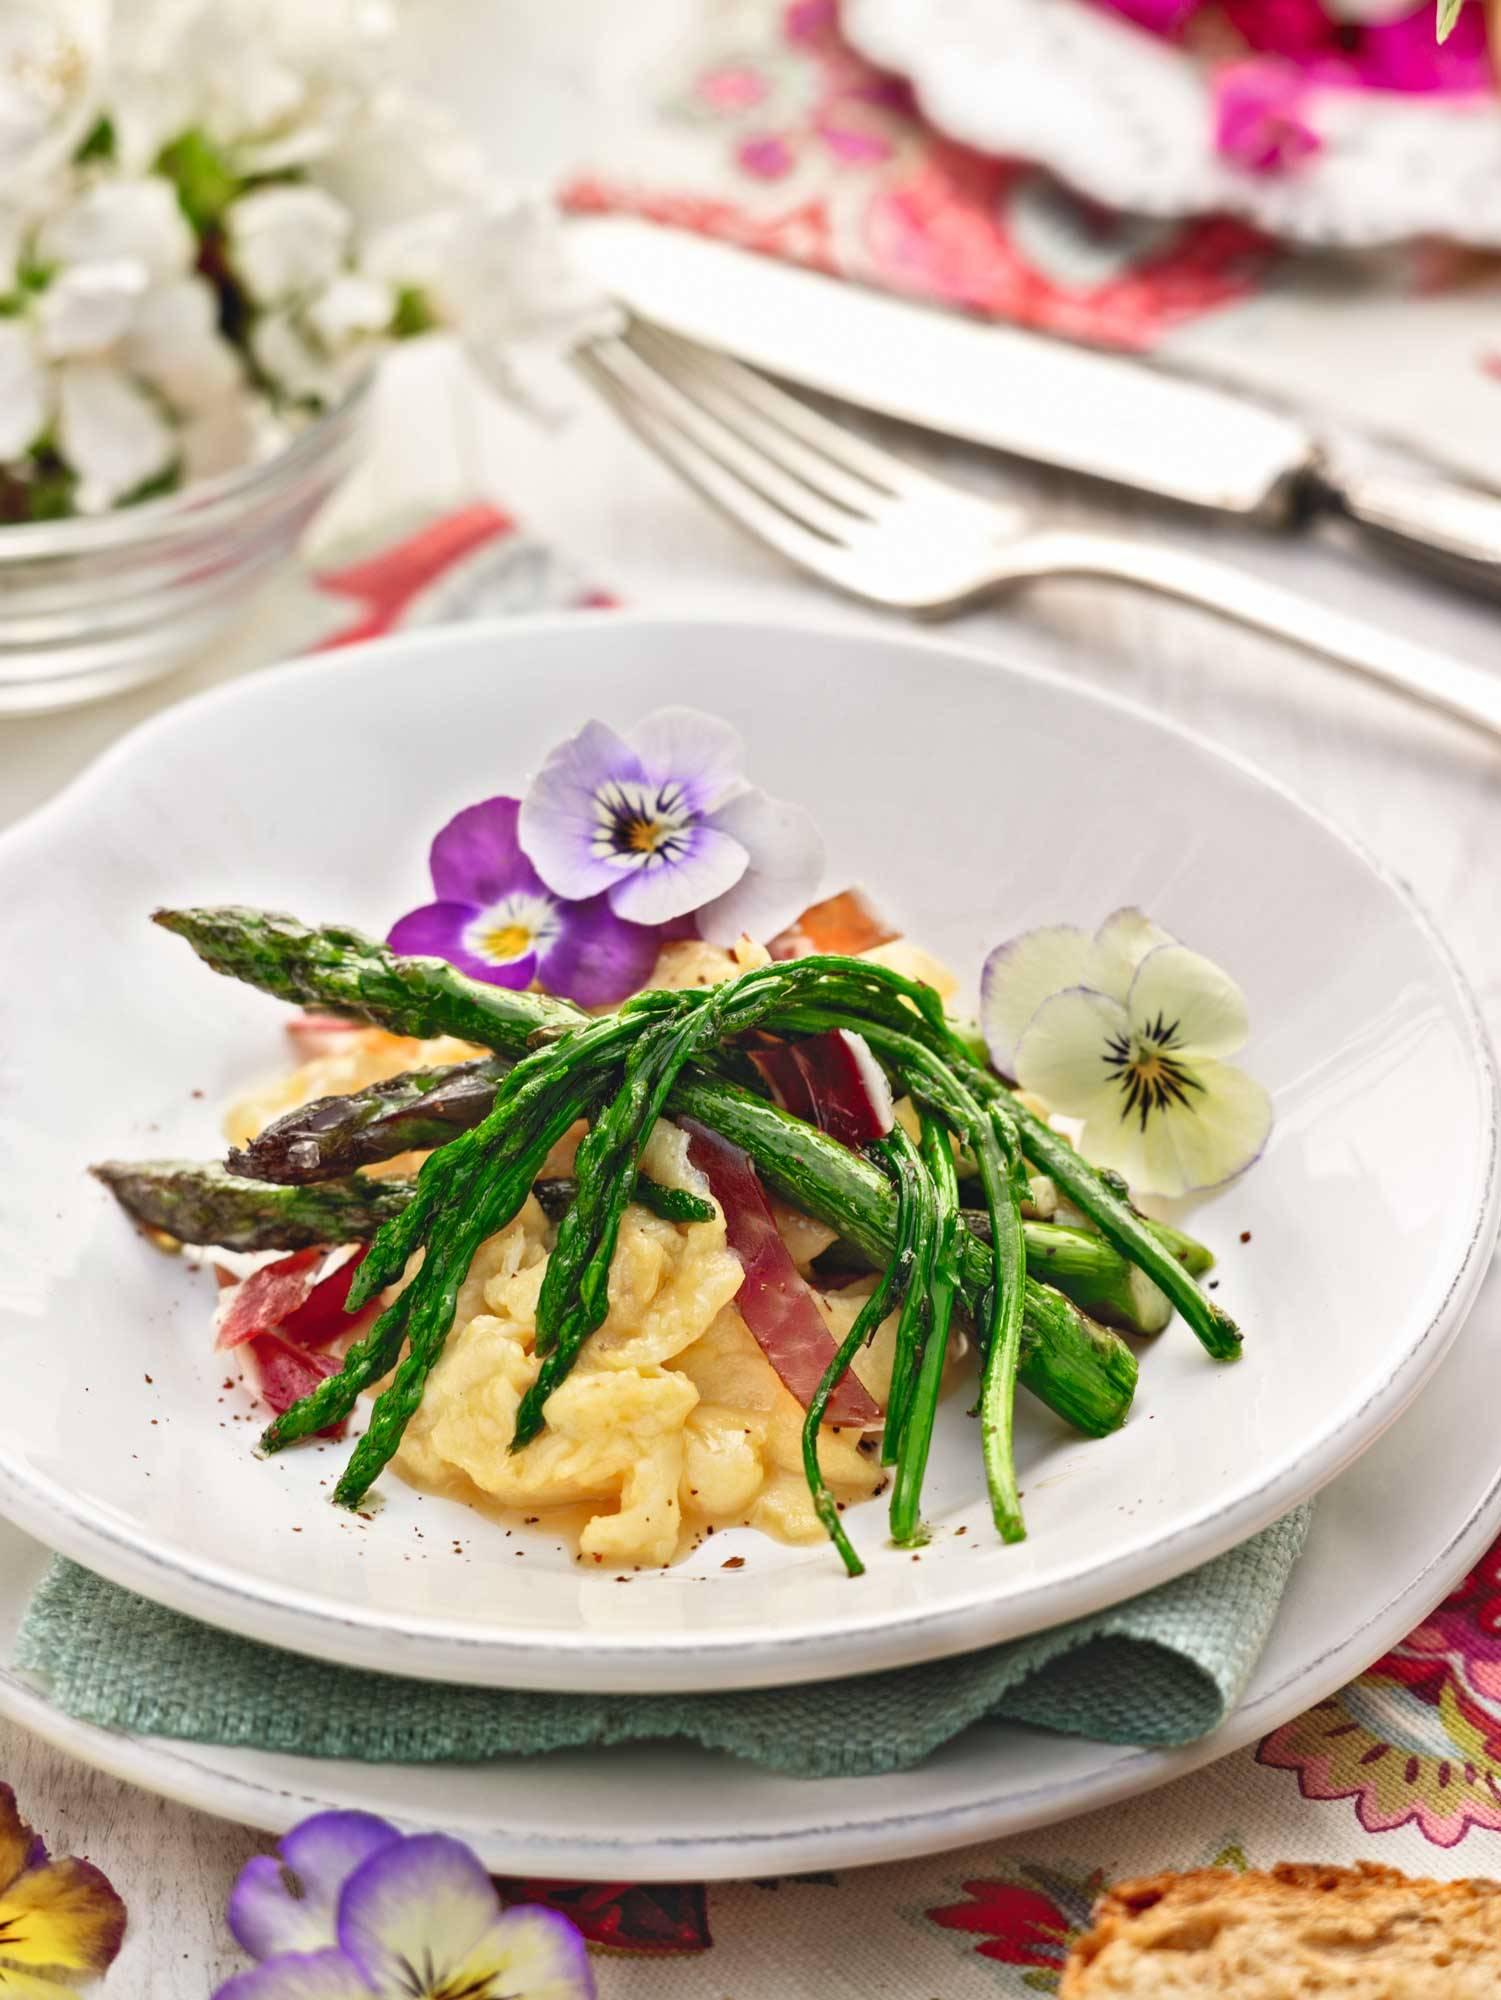 recipes-improve-health-eggs-asparagus 00382795